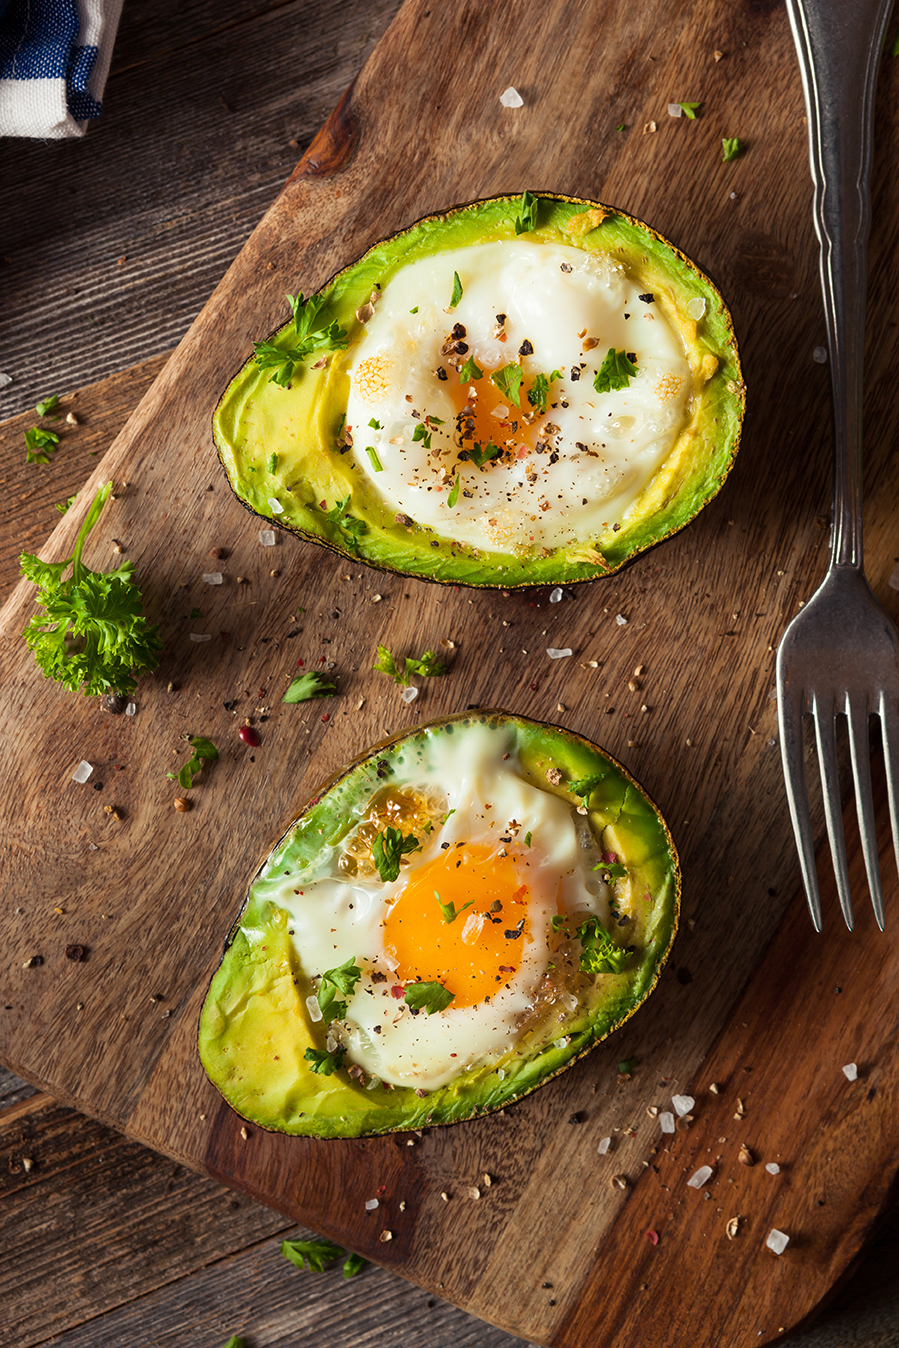 Ei Avocado Frühstück für Keto Diät